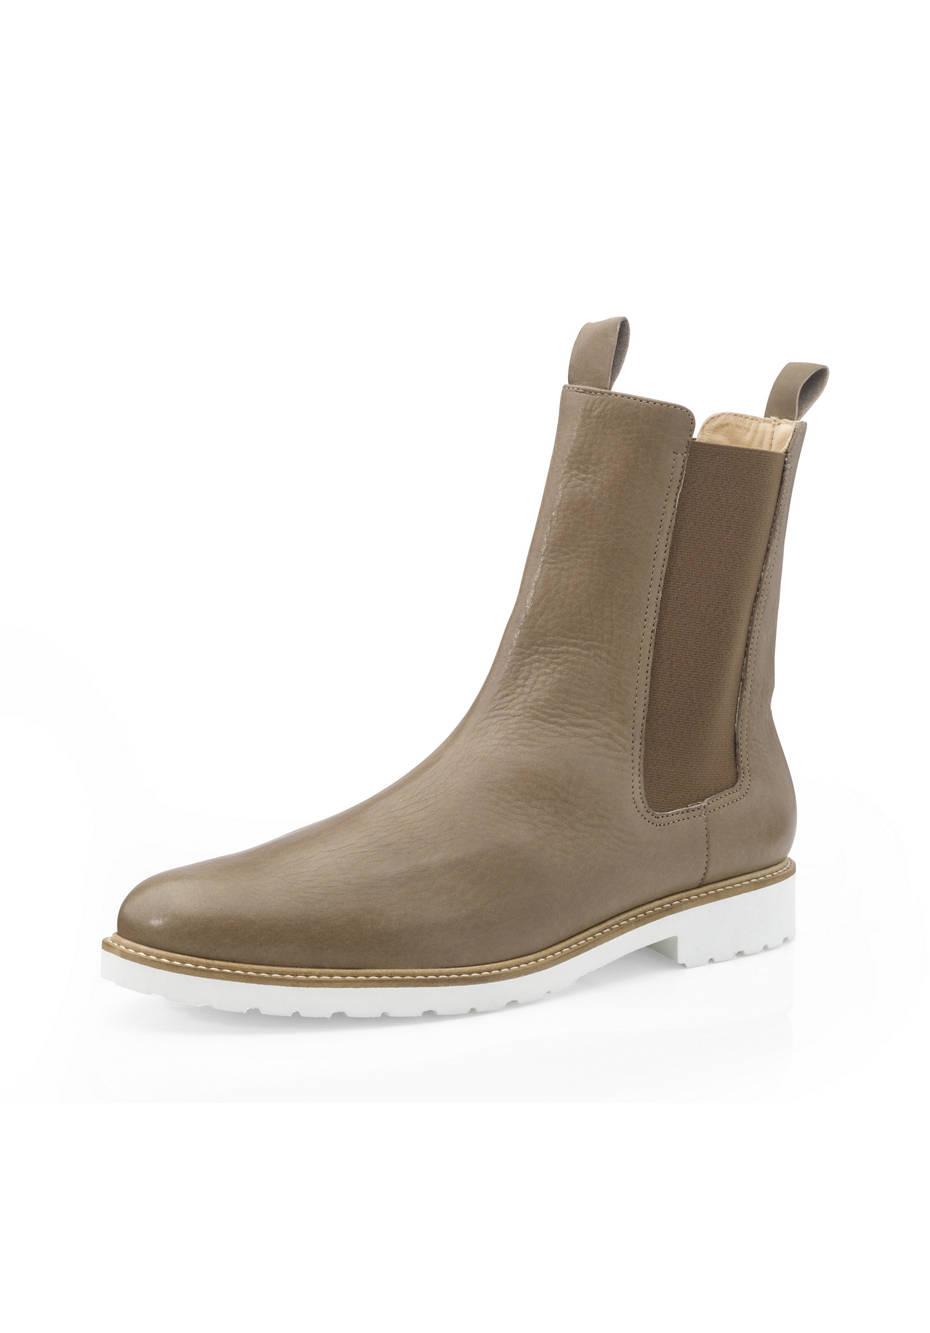 Herren Chelsea Boots aus Leder